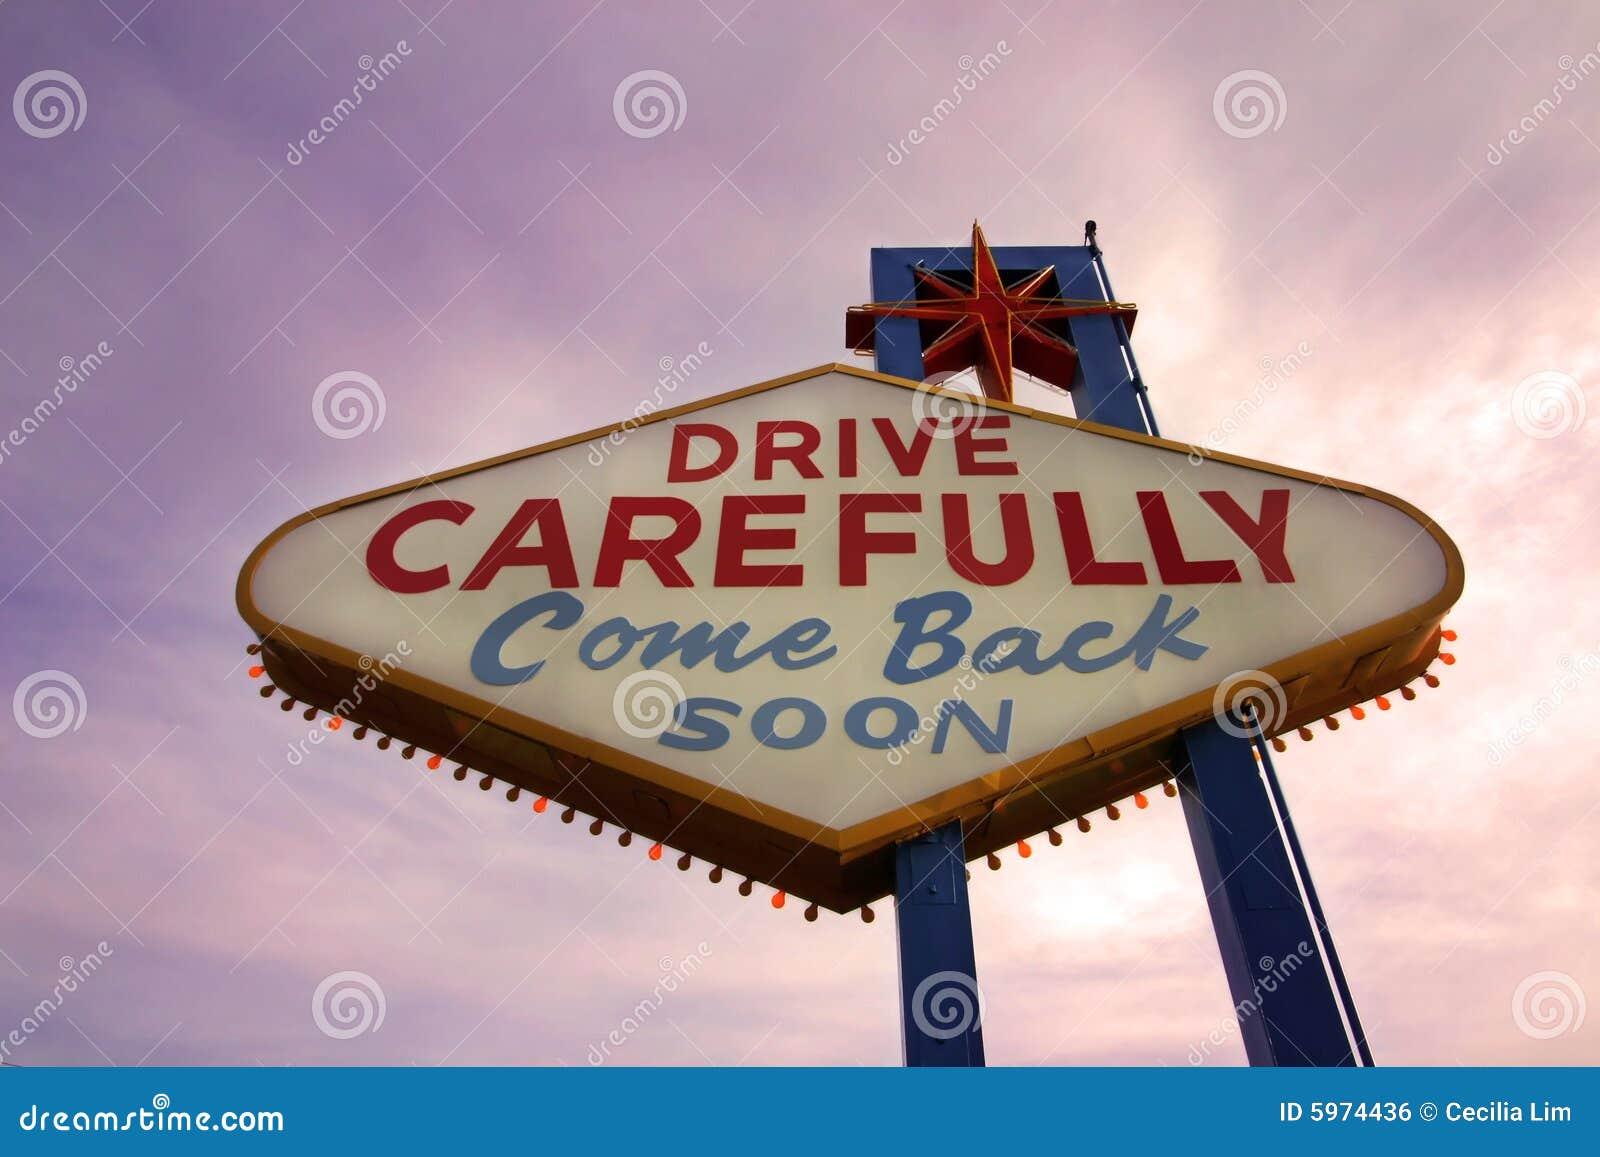 come back soon las vegas sign at sunset stock photo image 5974436. Black Bedroom Furniture Sets. Home Design Ideas